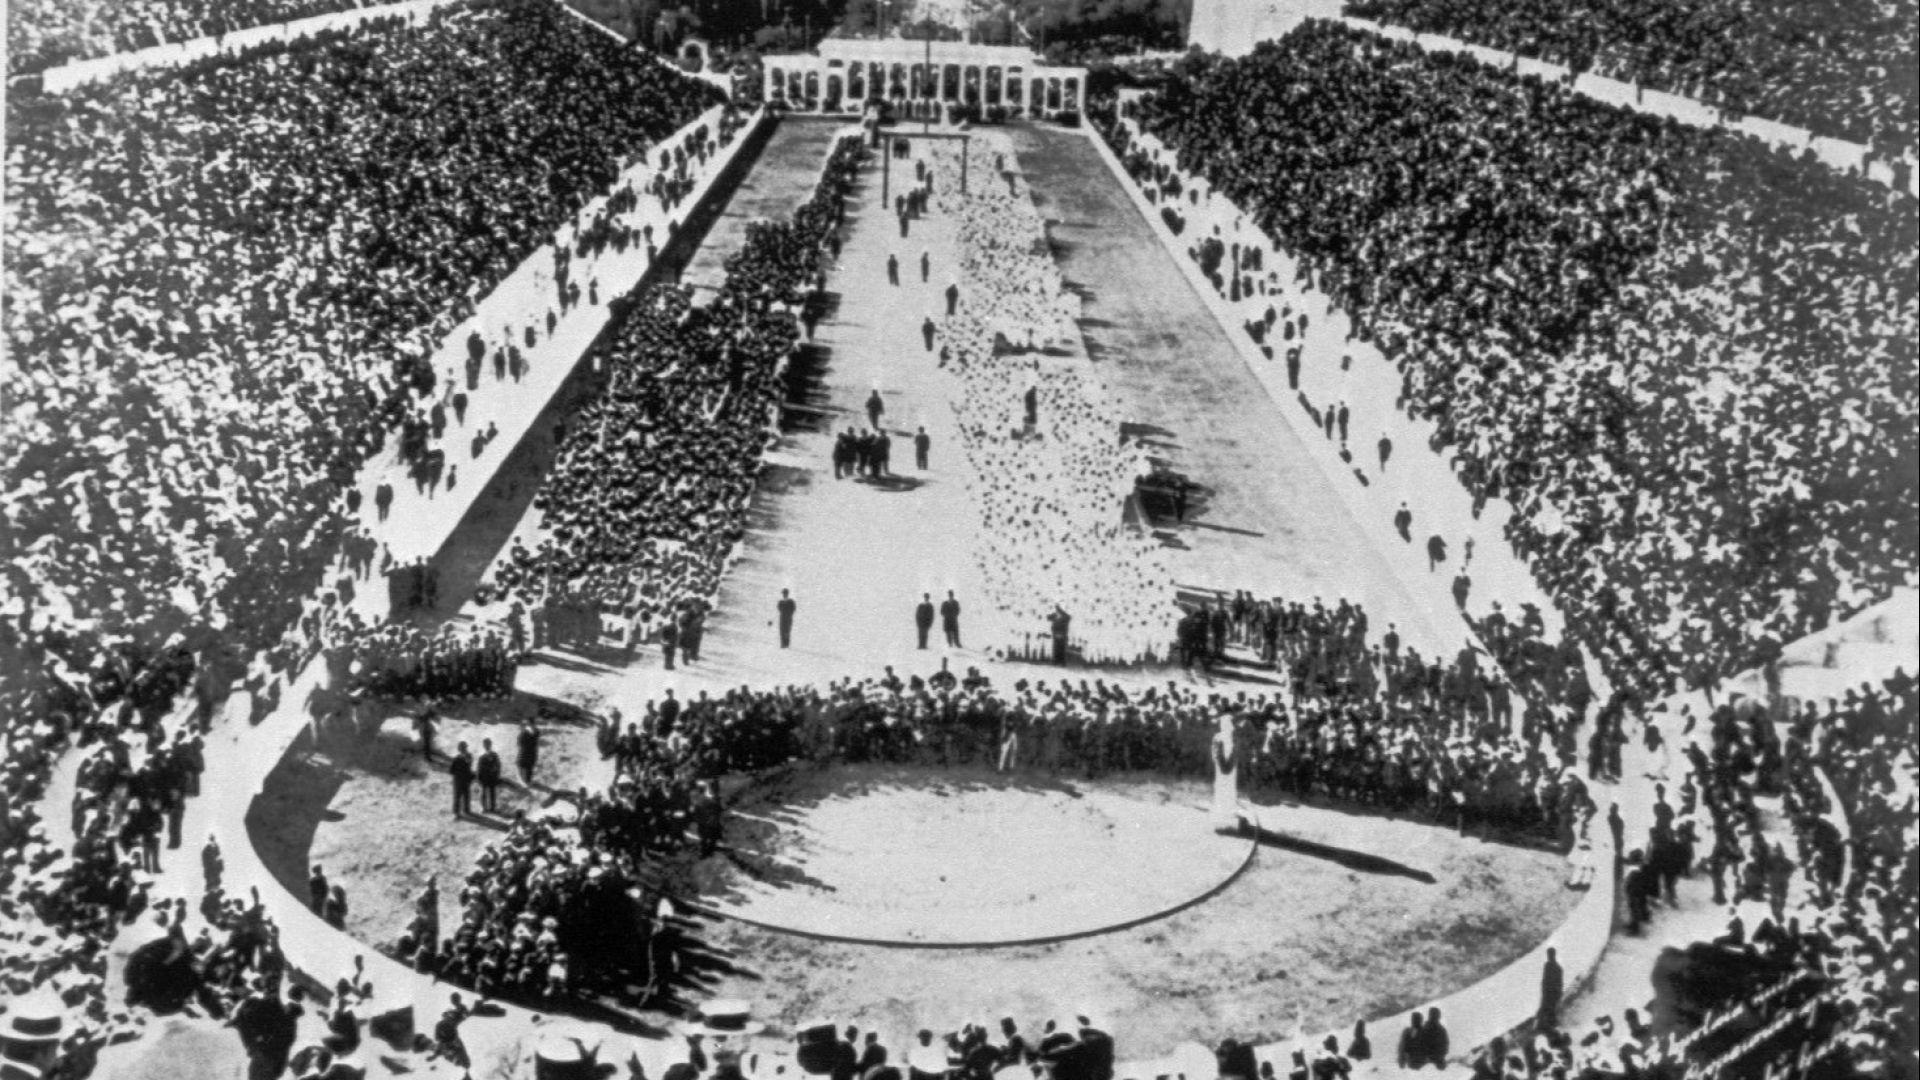 Платиха рекордни 8,8 милиона долара за Олимпийската харта на Кубертен